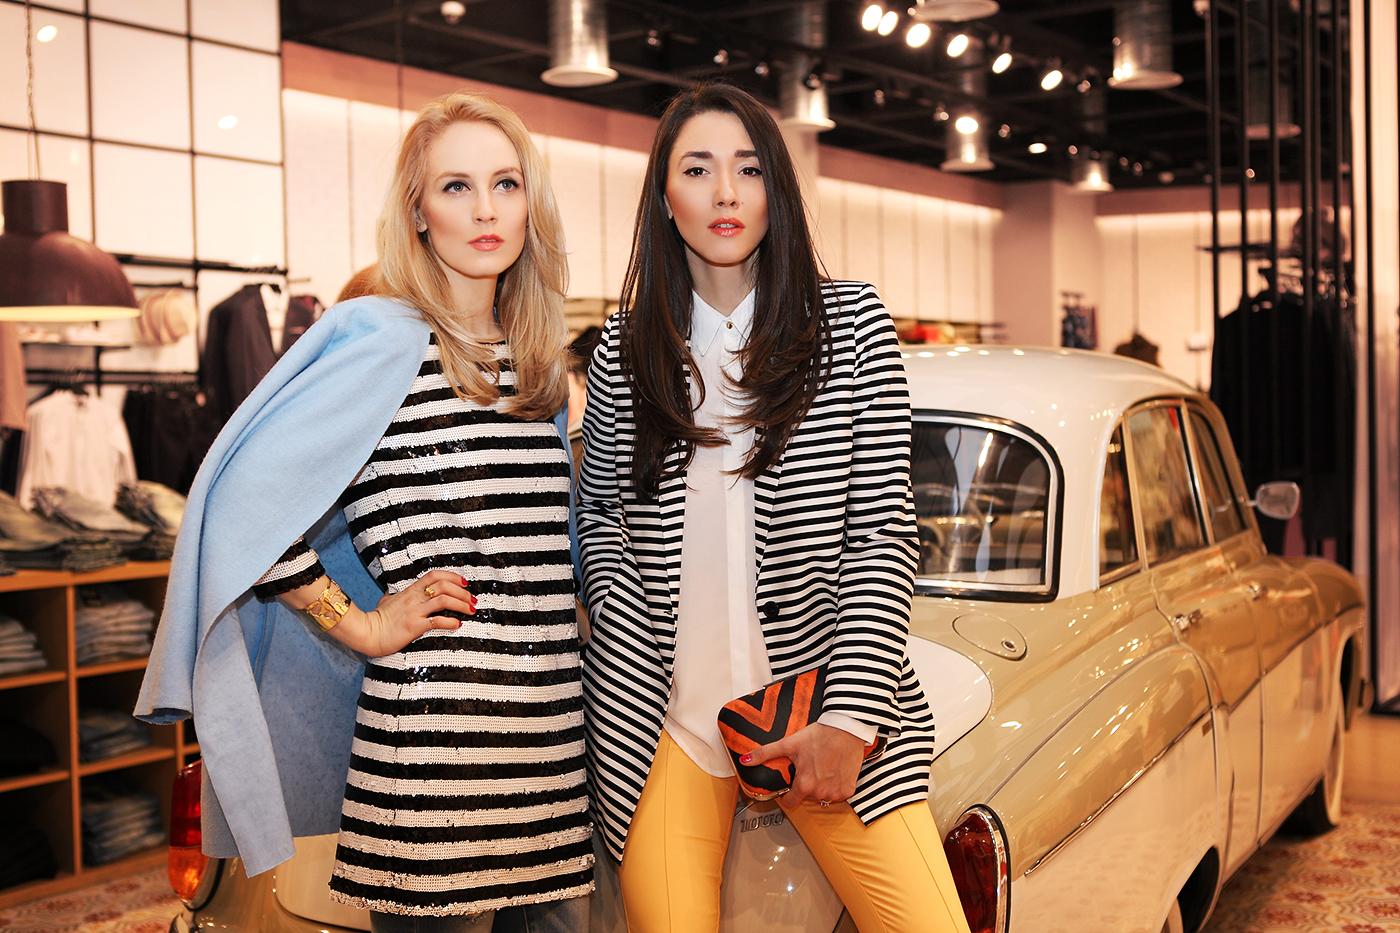 ploiesti_shopping_city_fabulous muses la ploiesti_shopping session_diana enciu_alina tanasa_absolutely fabulous (5)